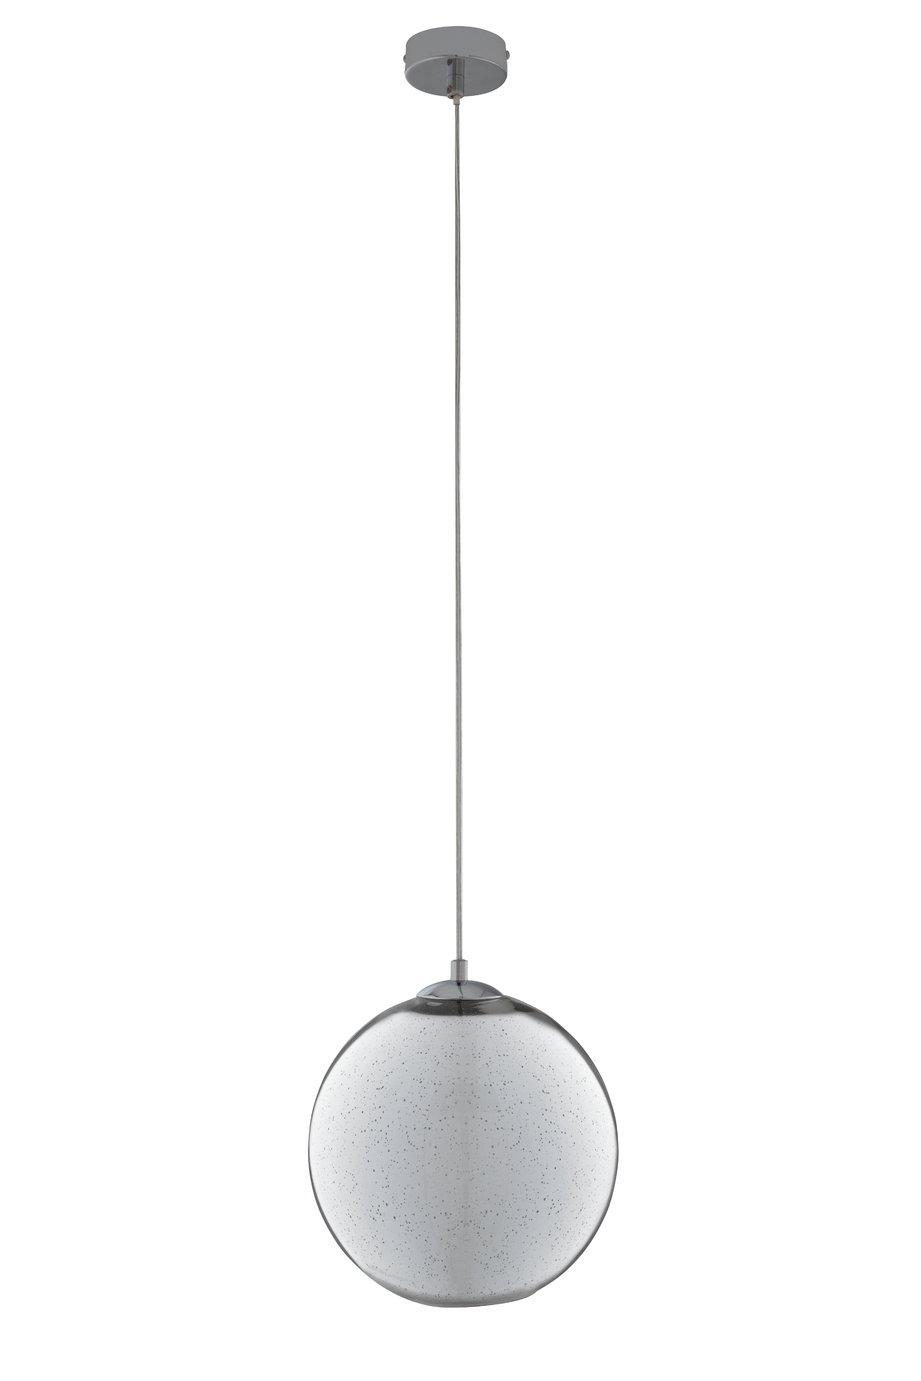 Argos Home Imogen Mercury Ball Pendant - Chrome